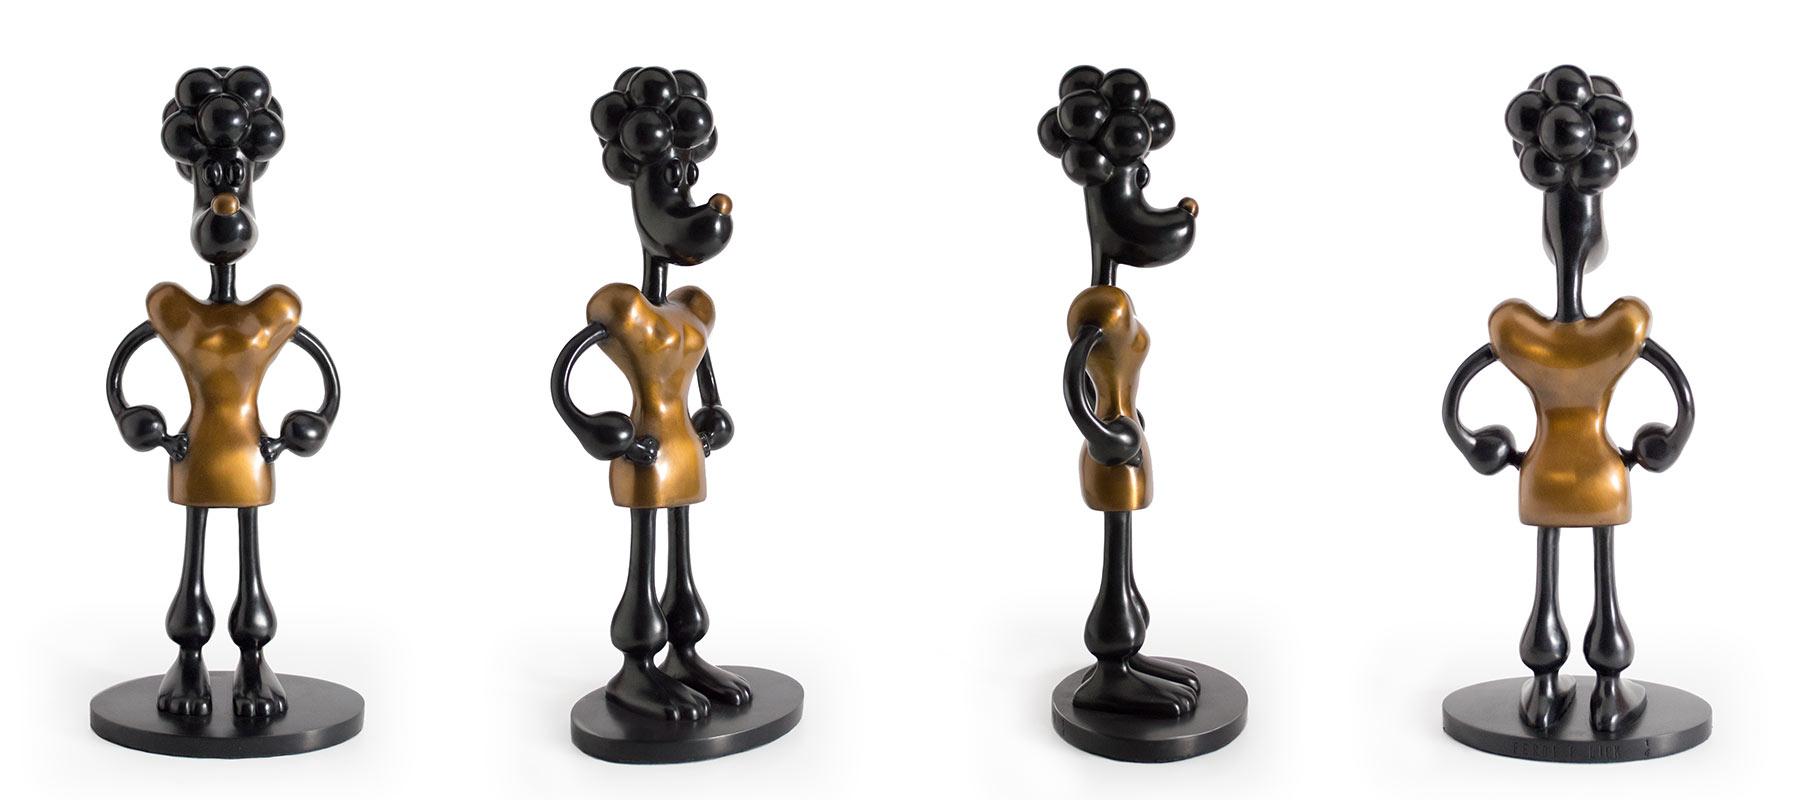 Black and bronze cartoon dog sculpture, Mounted on black patina bronze base